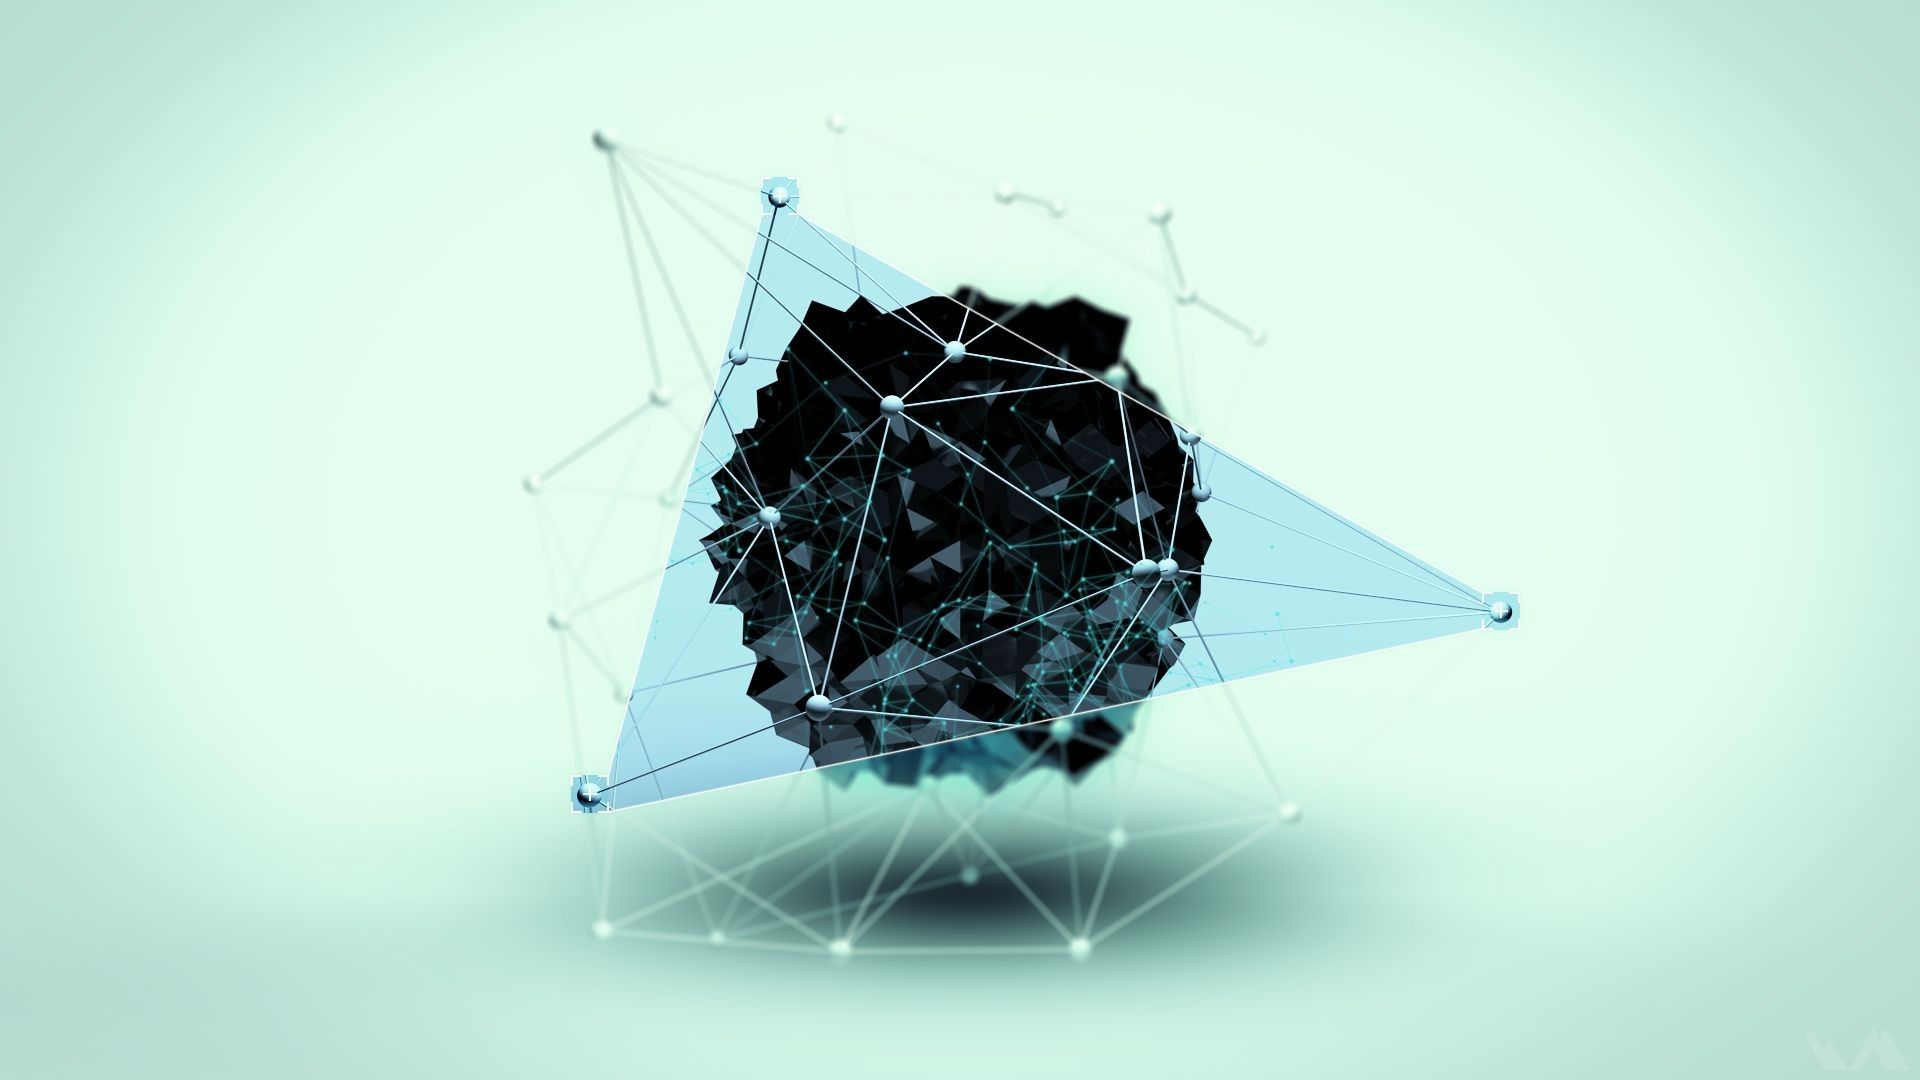 Geometry Digital Art Shapes HD Wallpaper FullHDWpp Full HD ... - IMG